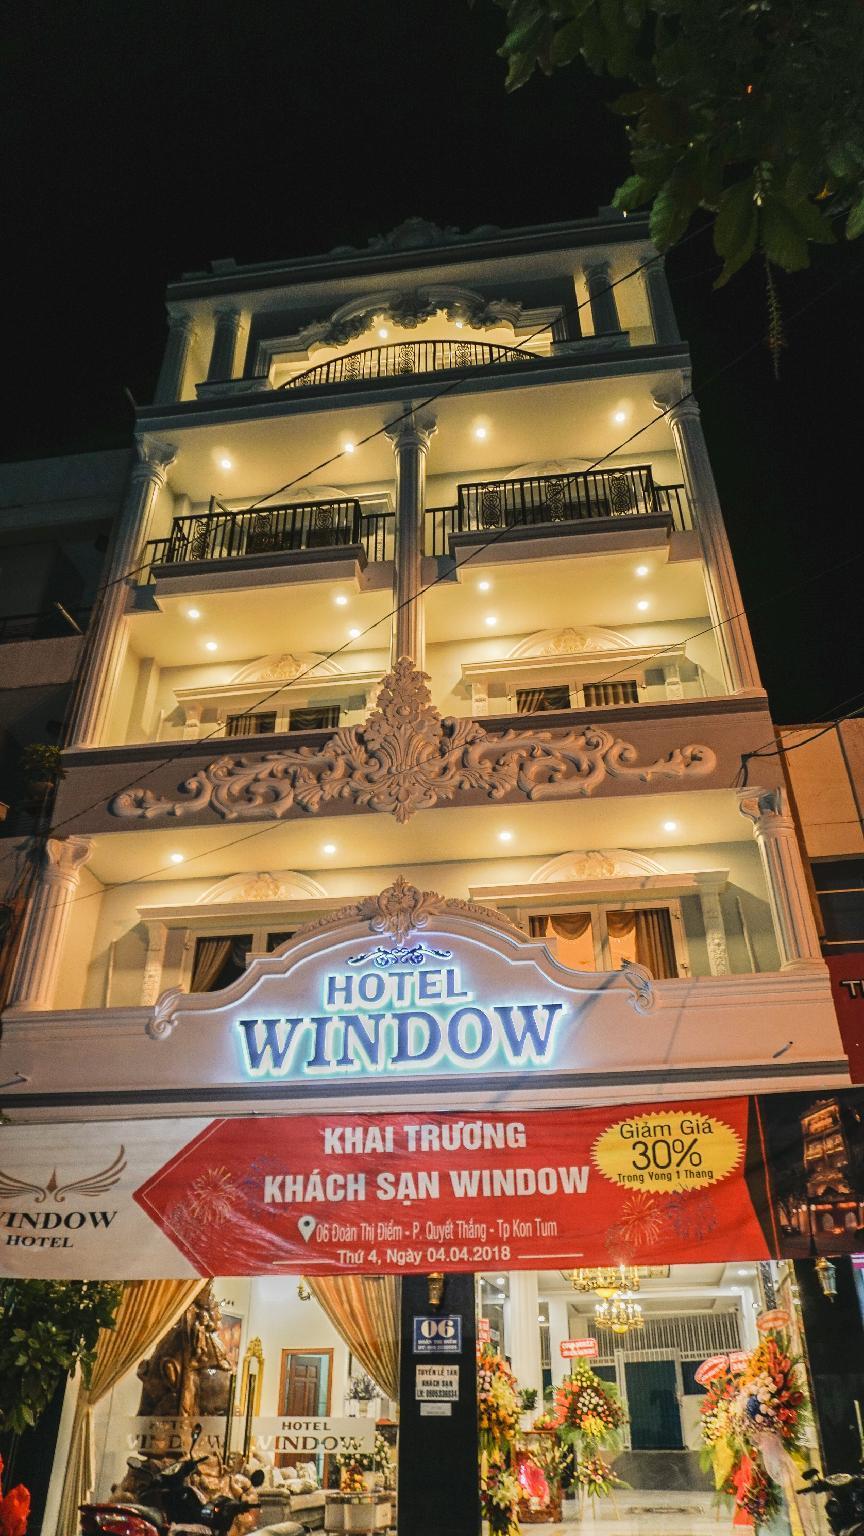 WINDOW HOTEL, Kon Tum